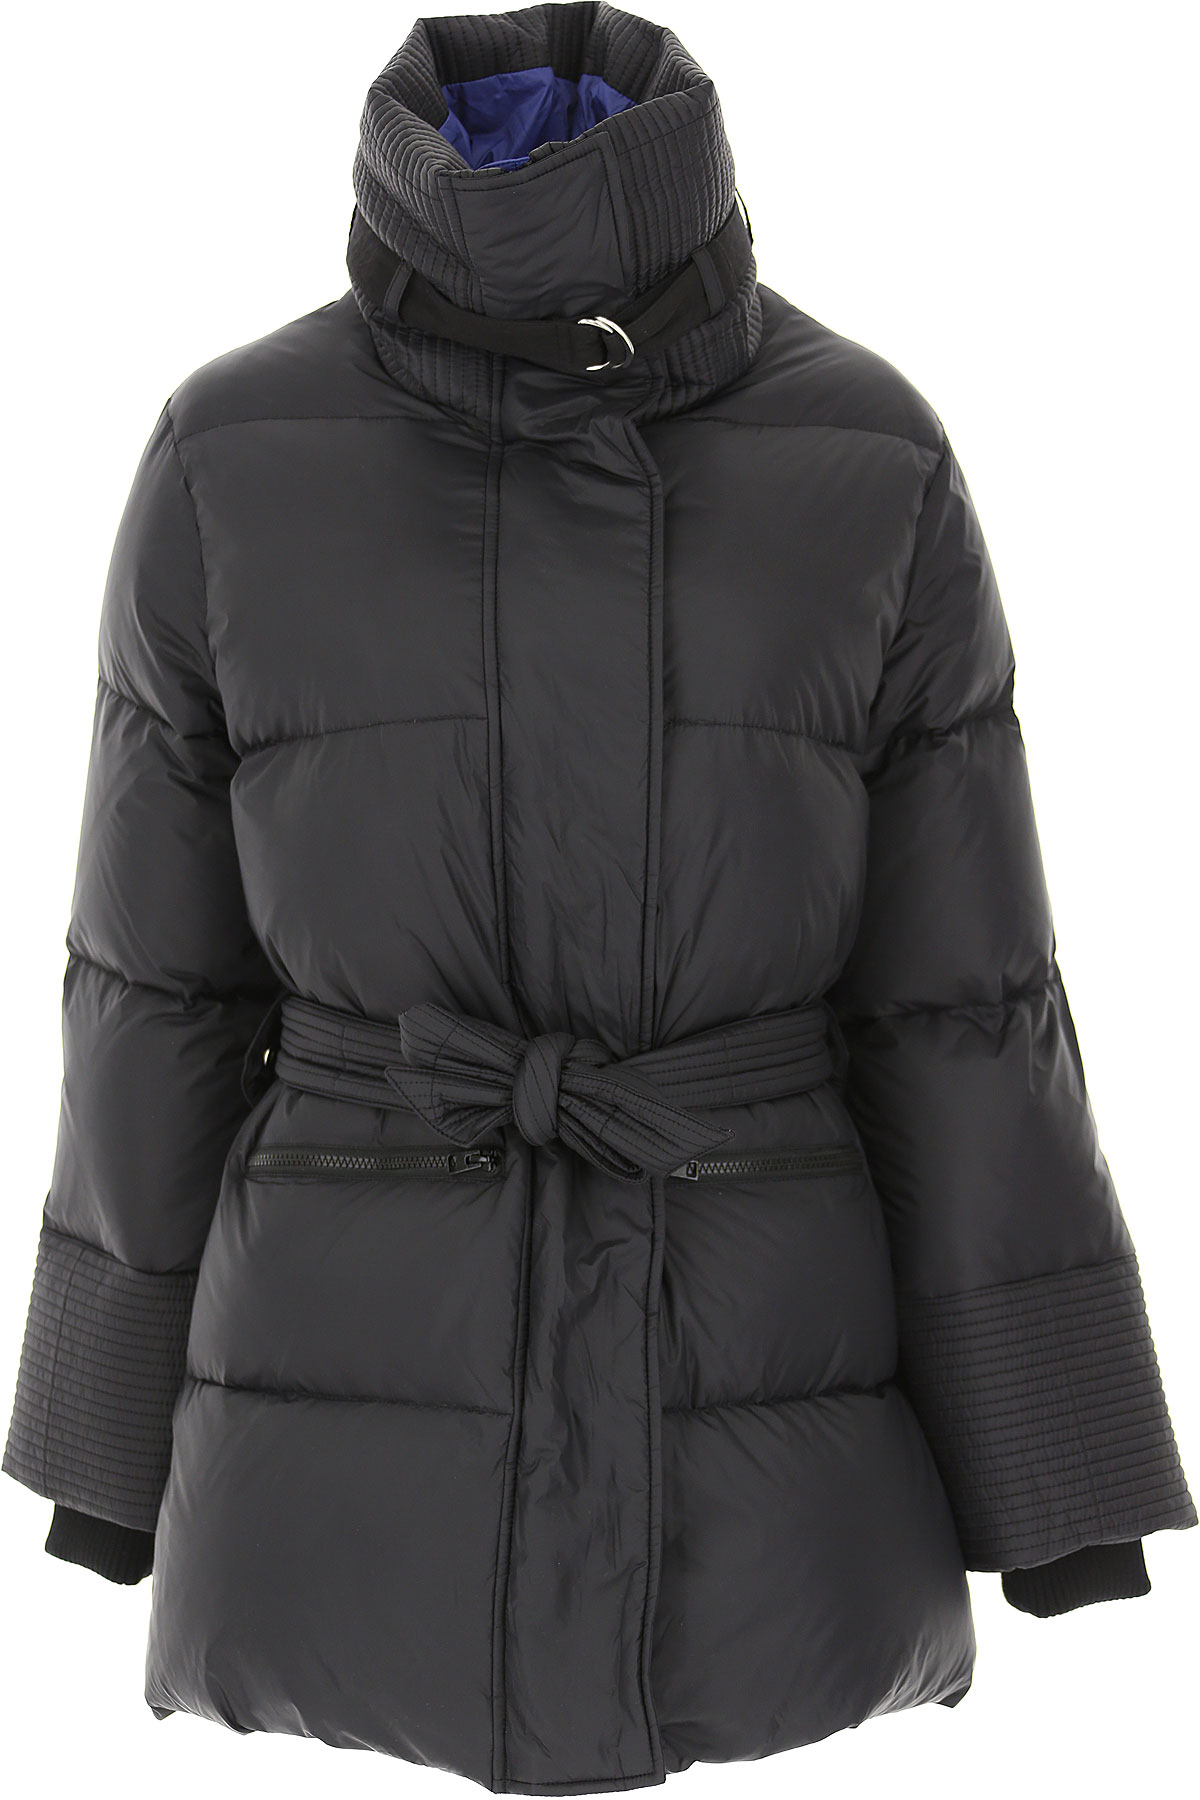 Rossignol Down Jacket for Women, Puffer Ski Jacket On Sale, Black, Down, 2019, 4 6